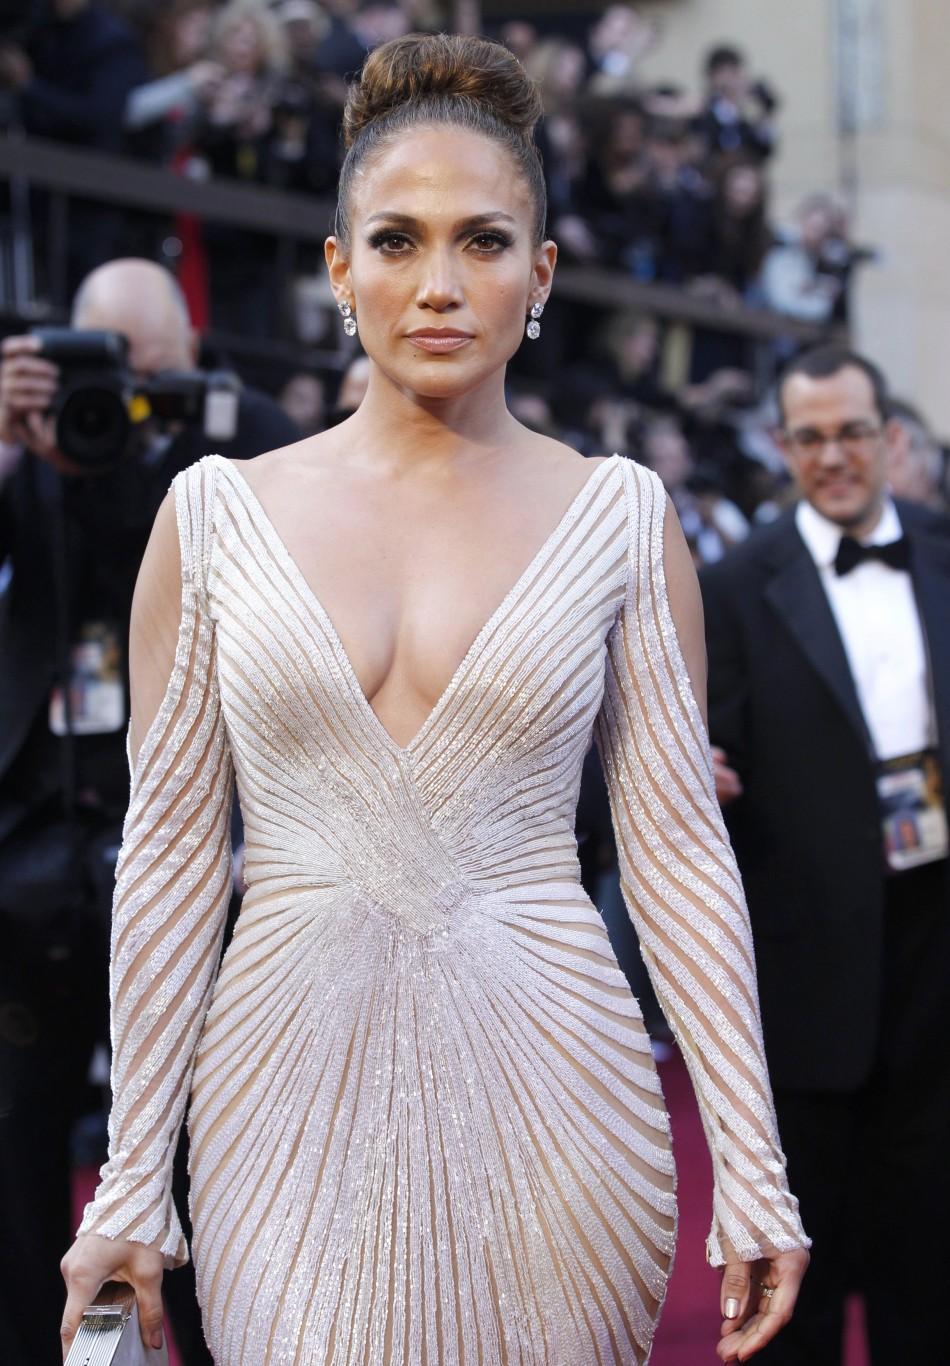 Jennifer Lopez Nip Slip at Oscar 2012